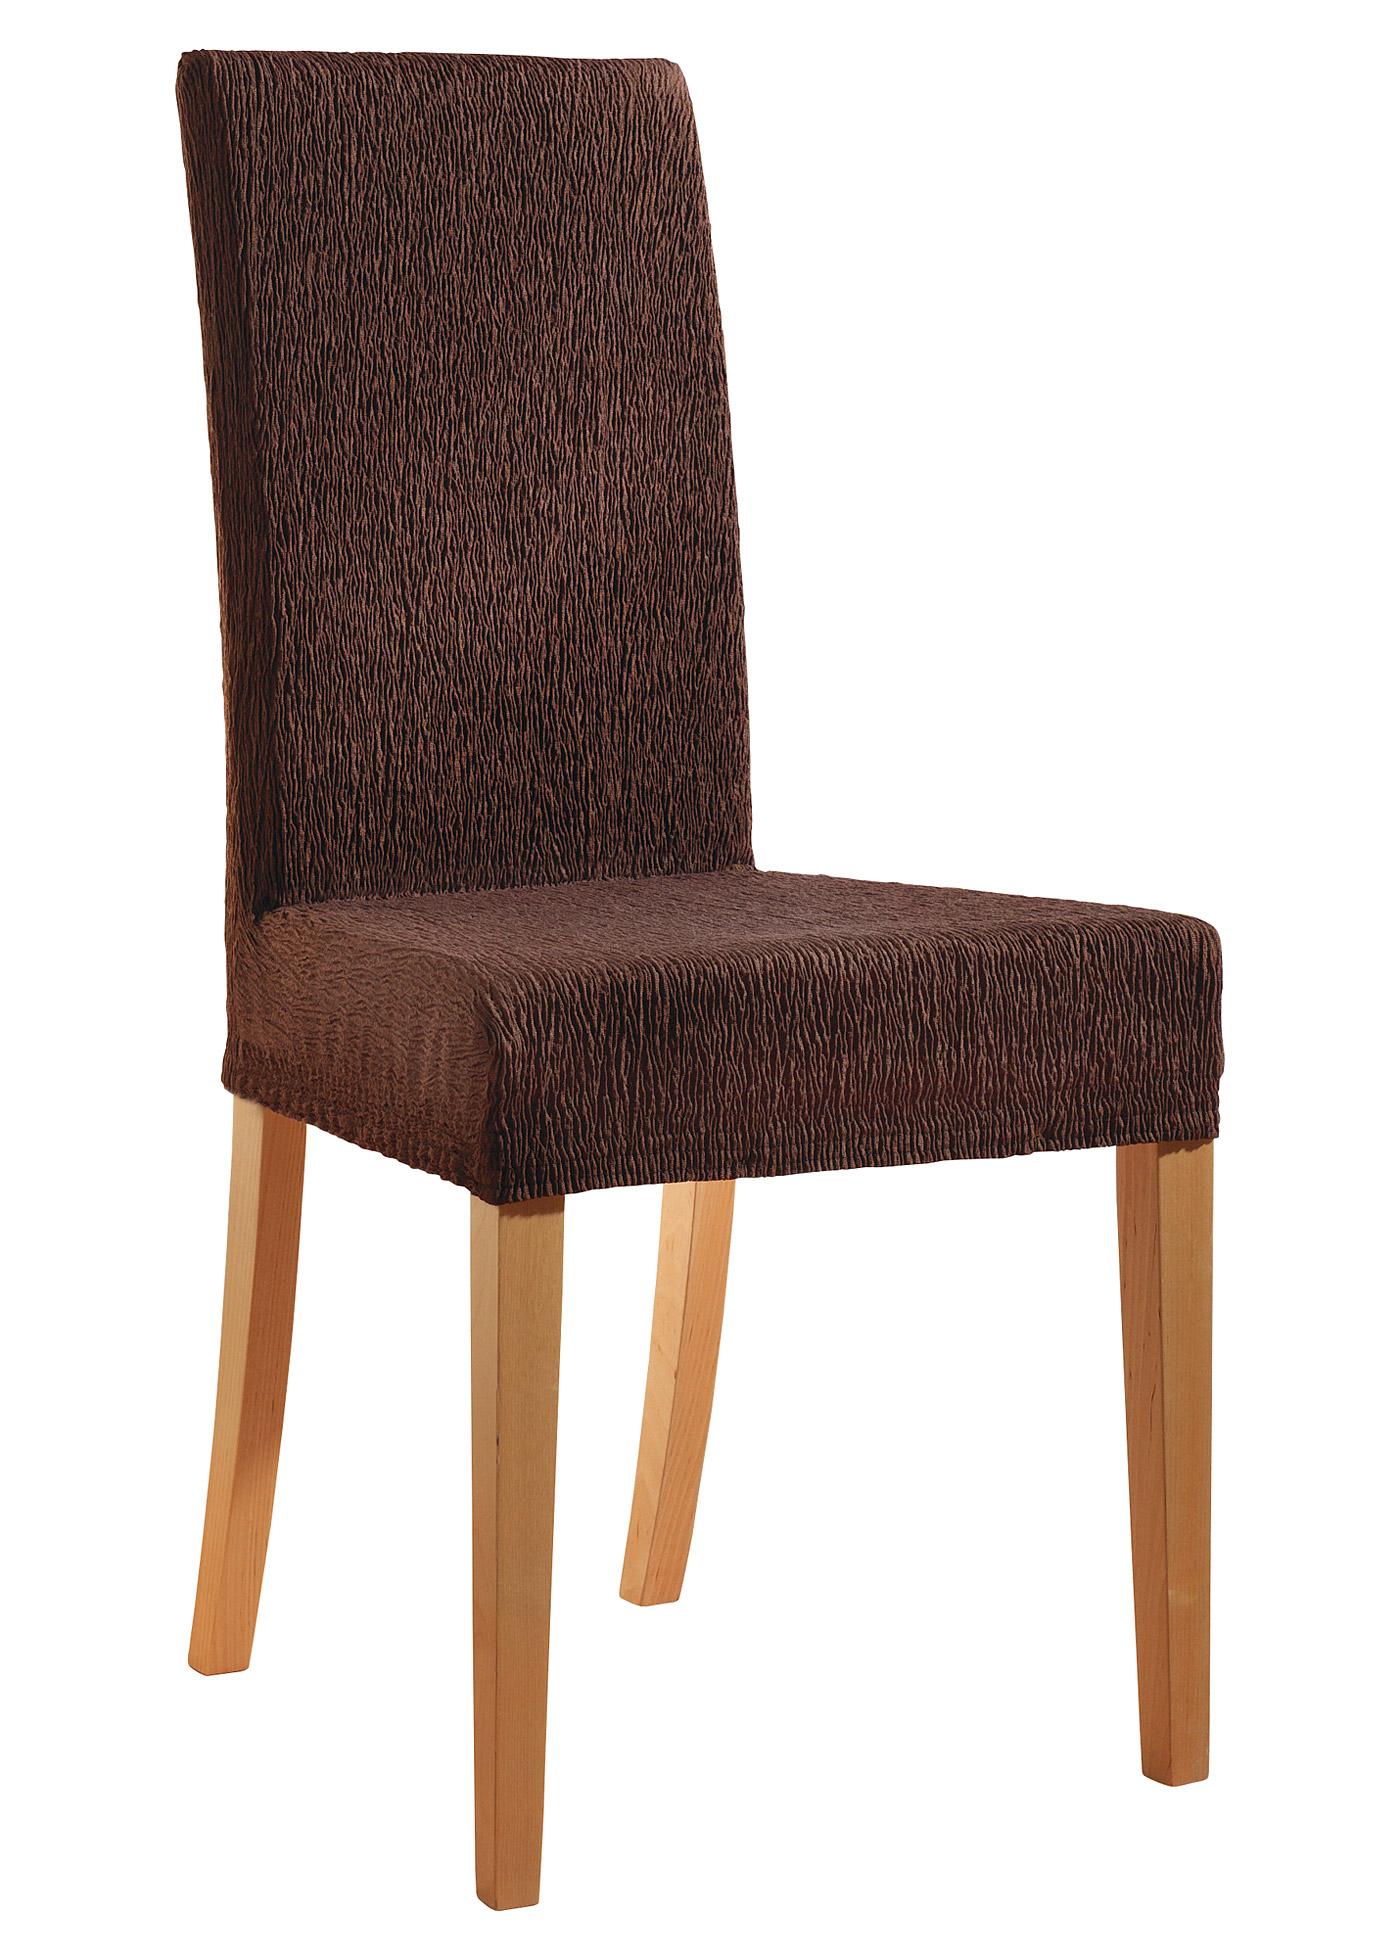 Largeur guide d 39 achat for Largeur chaise